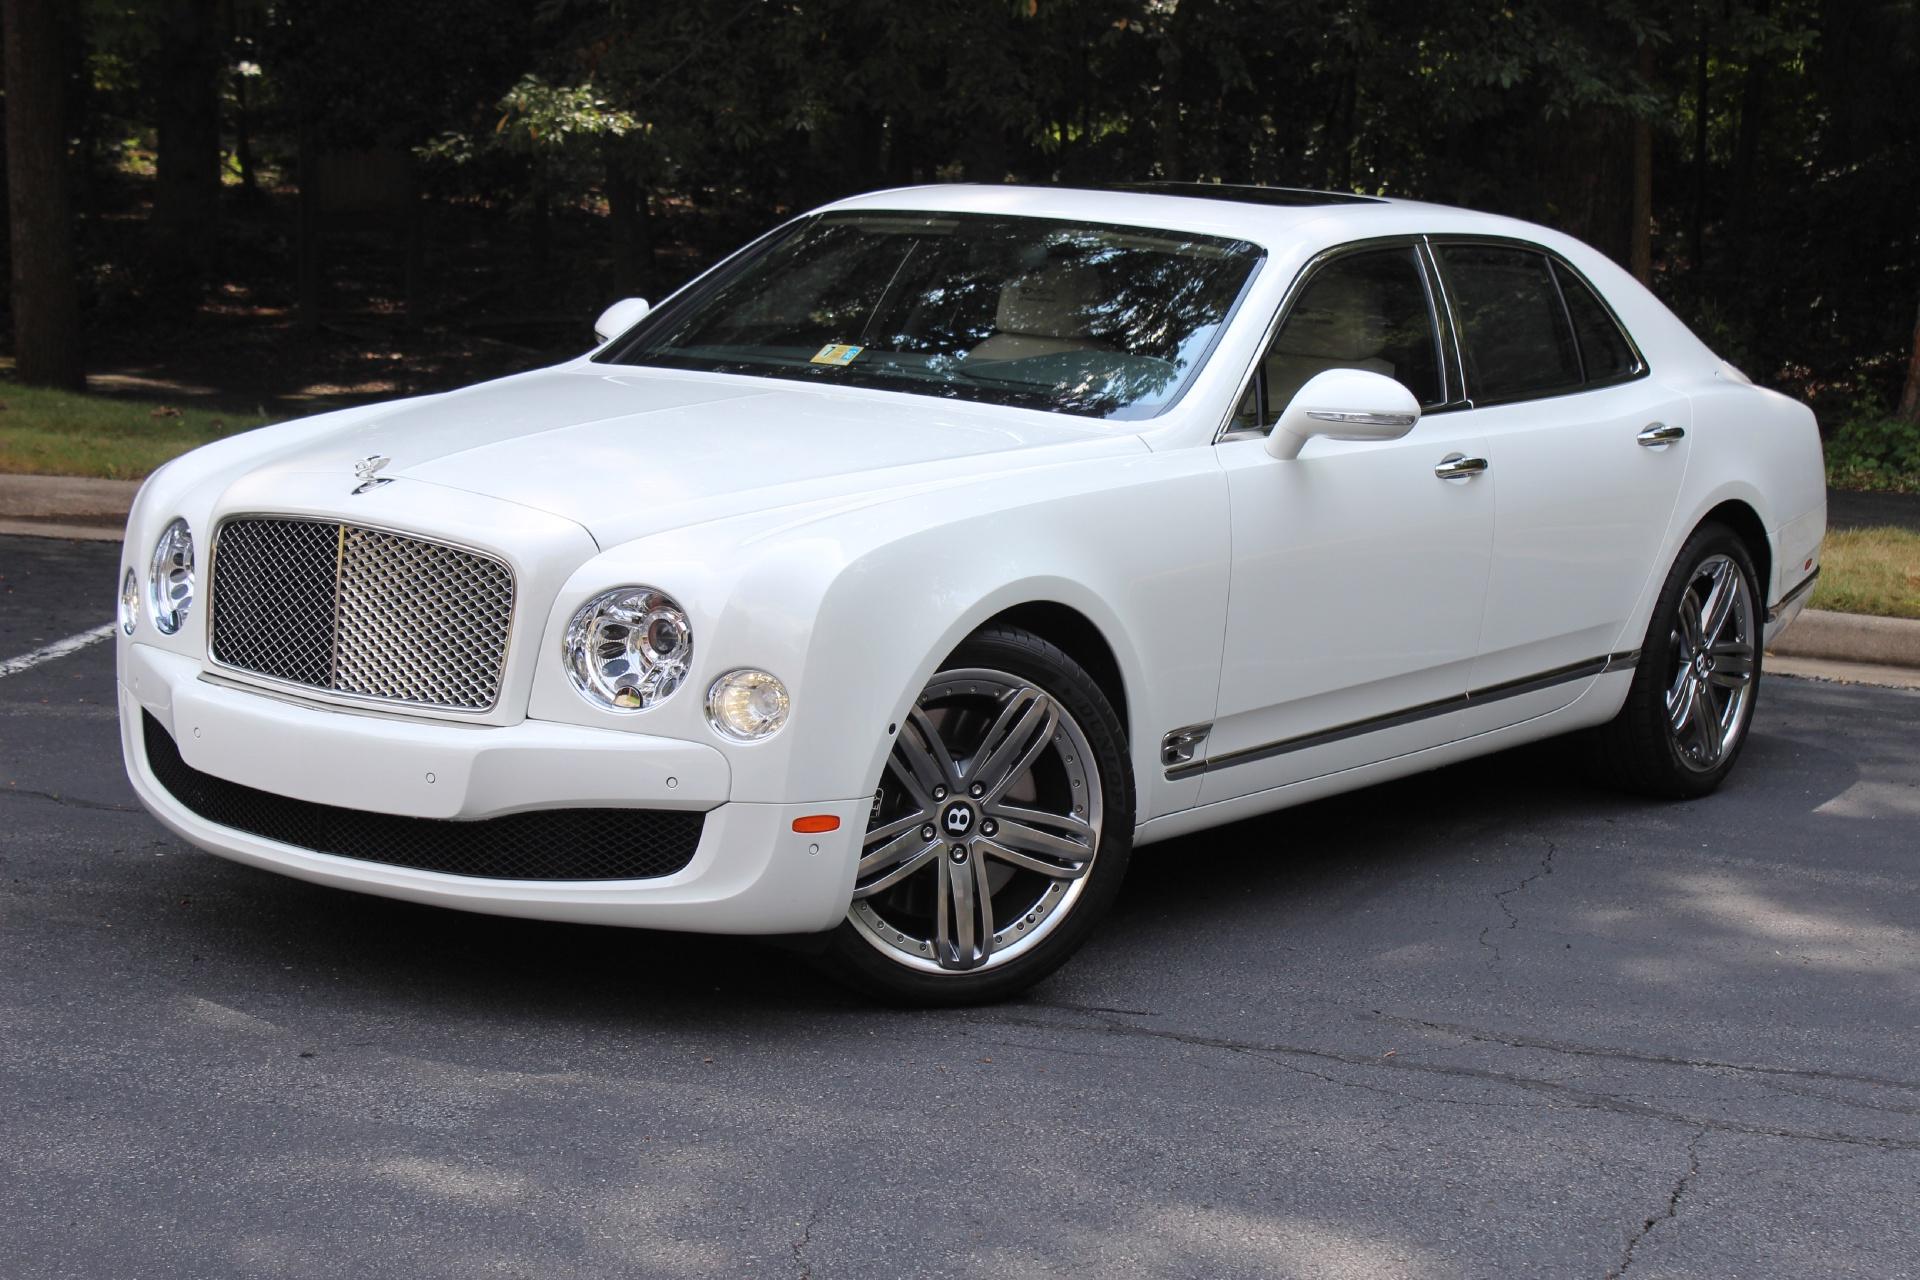 2013 Bentley Mulsanne Le Mans Edition Stock P018515 For Sale Near